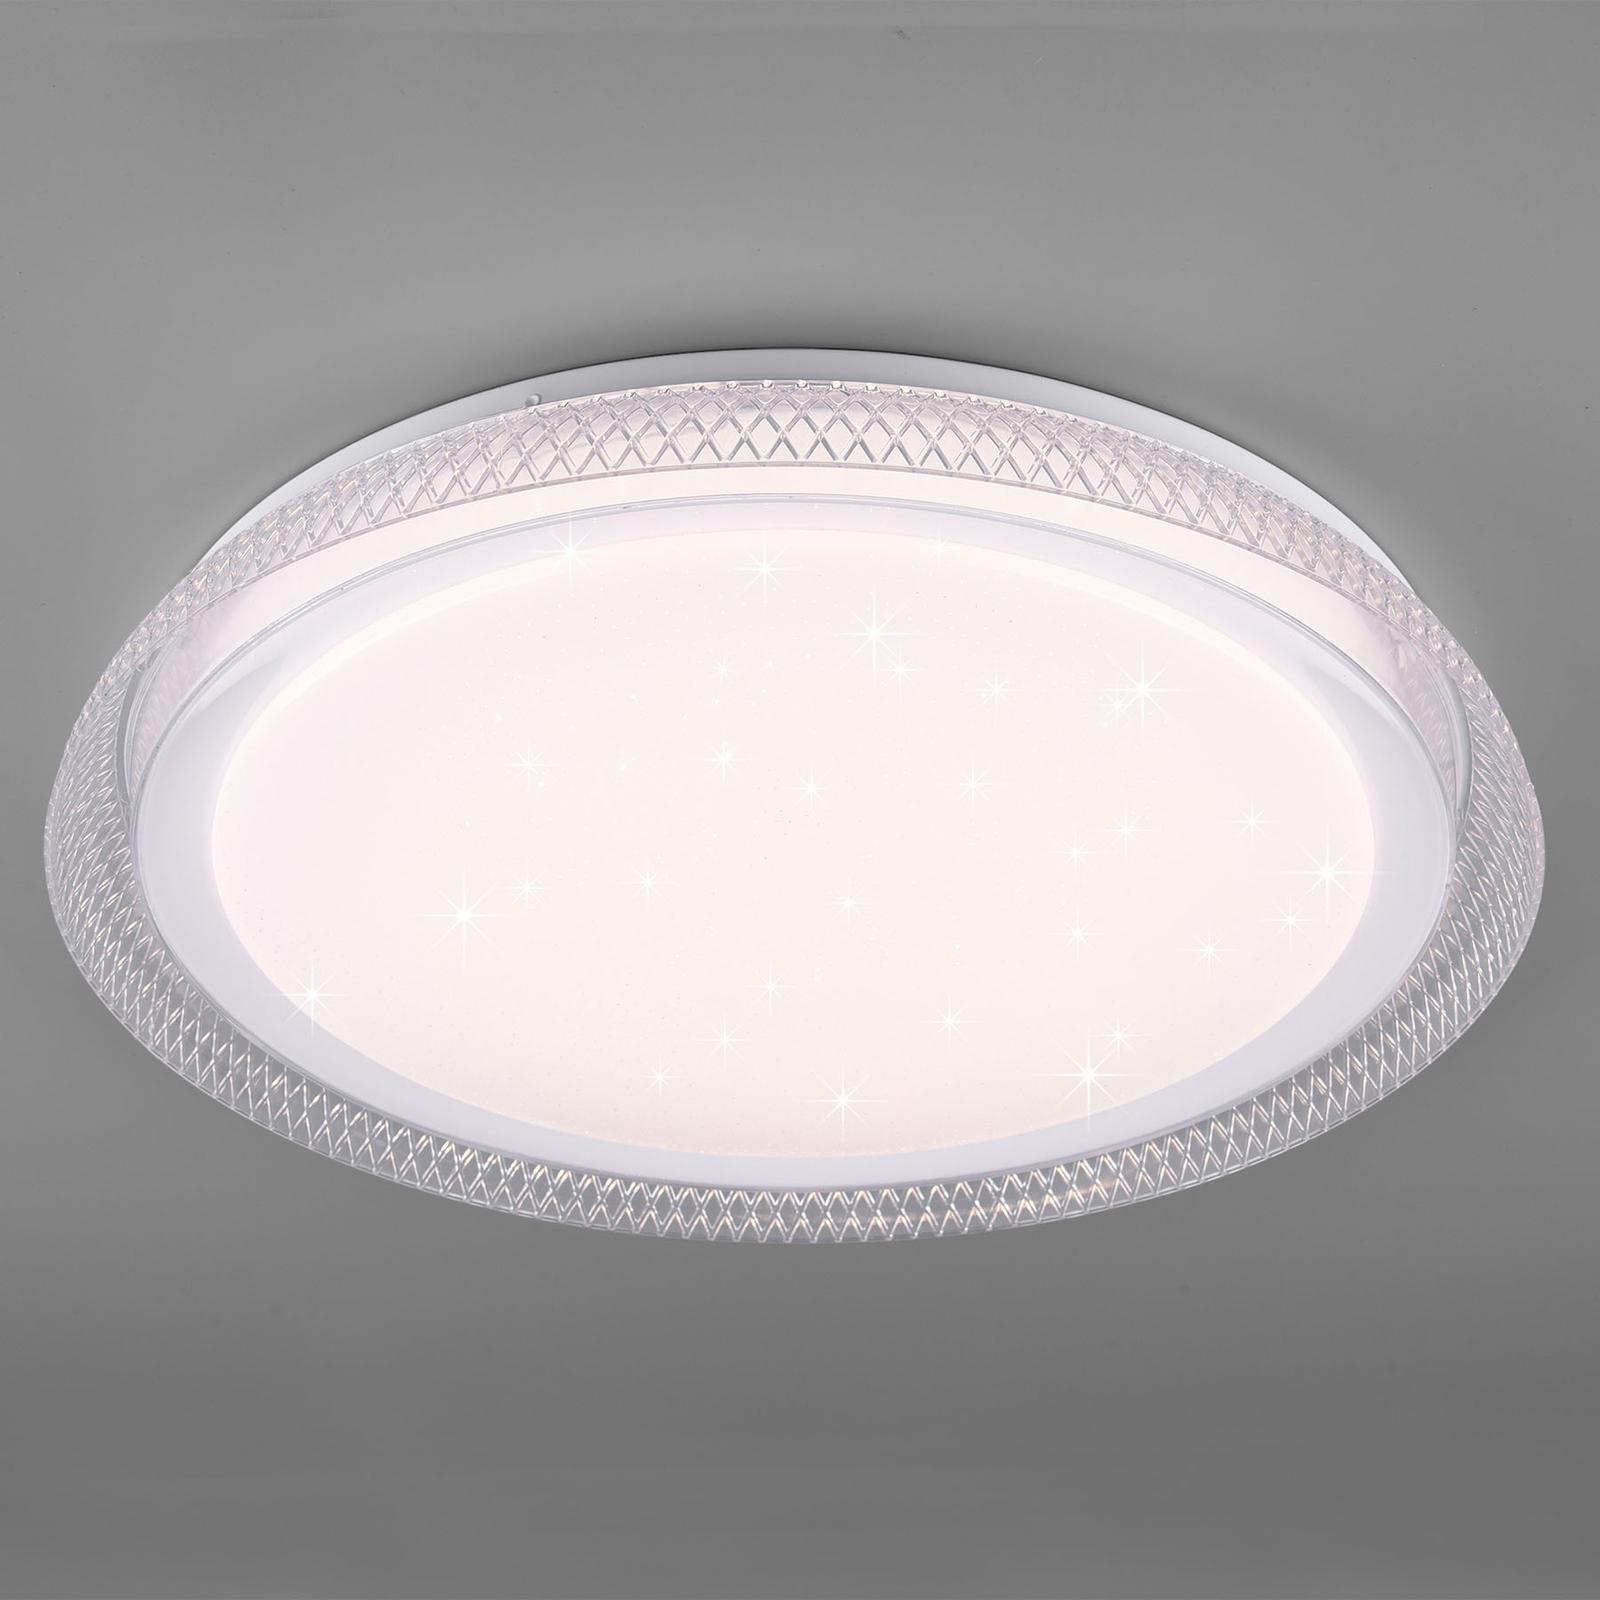 LED-kattovalaisin Heracles tunable white Ø 50cm